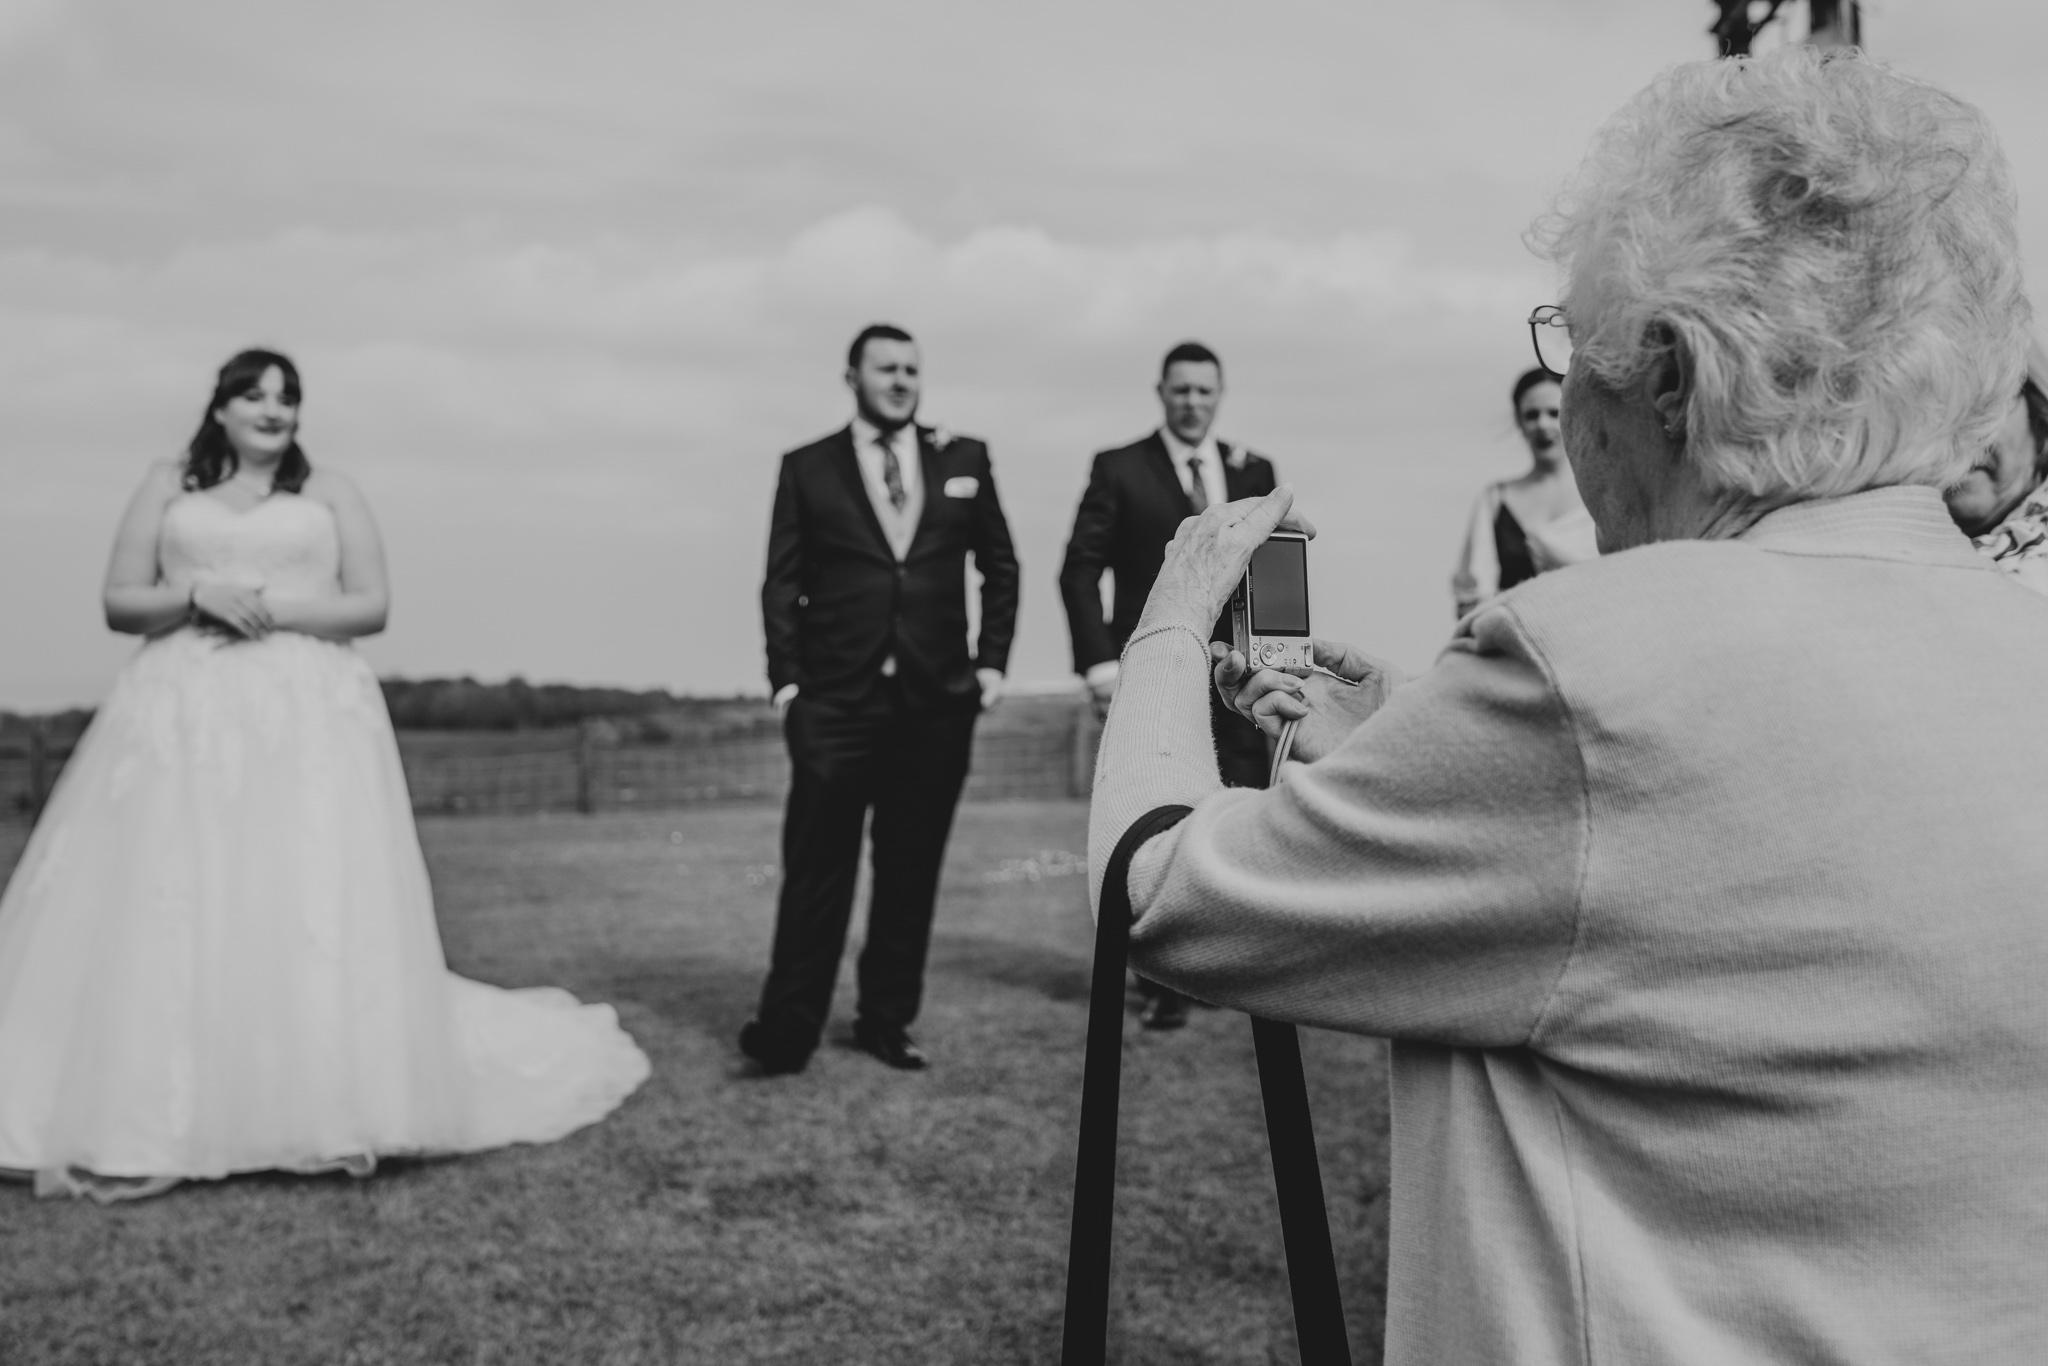 grace-sam-old-barn-clovelly-devon-wedding-photographer-grace-elizabeth-essex-suffolk-norfolk-wedding-photographer (76 of 132).jpg